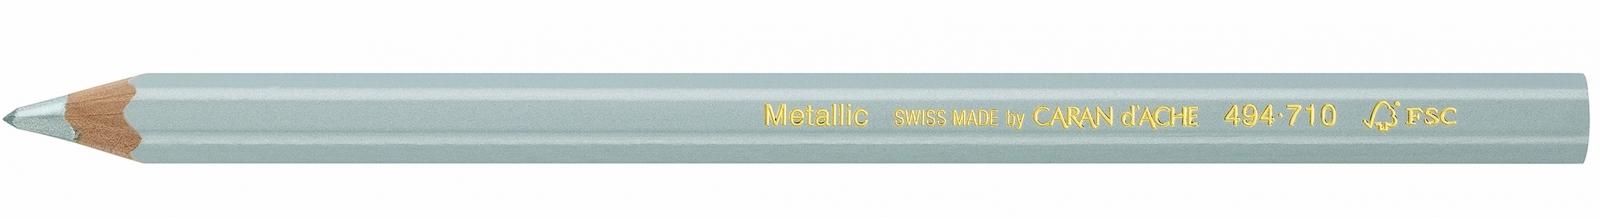 Lápis Maxi Jumbo Metallic Carandache 494 710 Verde - Papelaria Botafogo